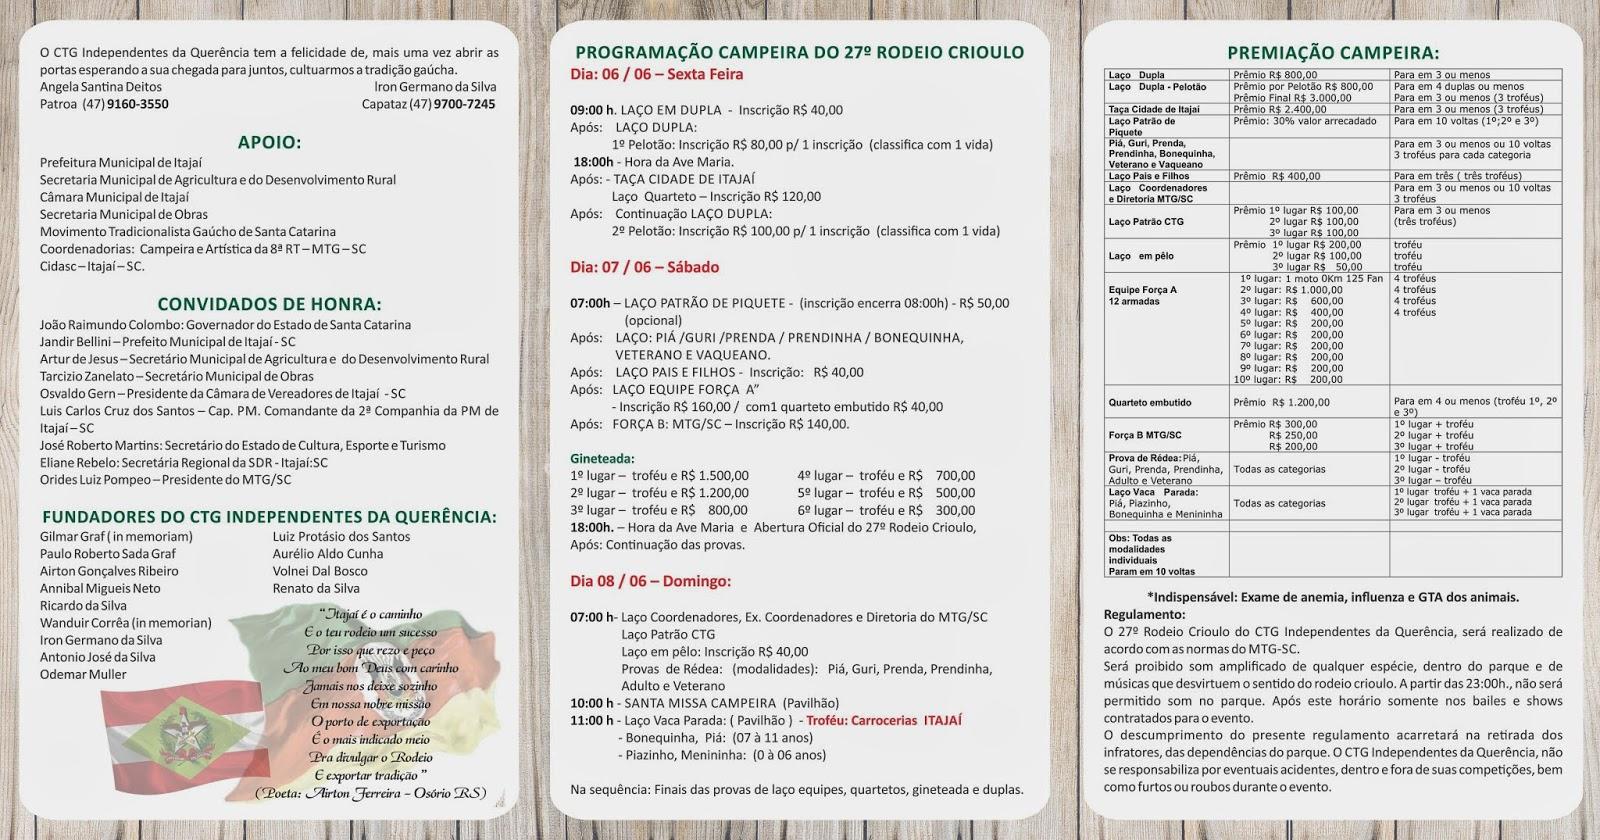 27º Rodeio Crioulo do CTG Independentes da Querência - Itajaí SC -2